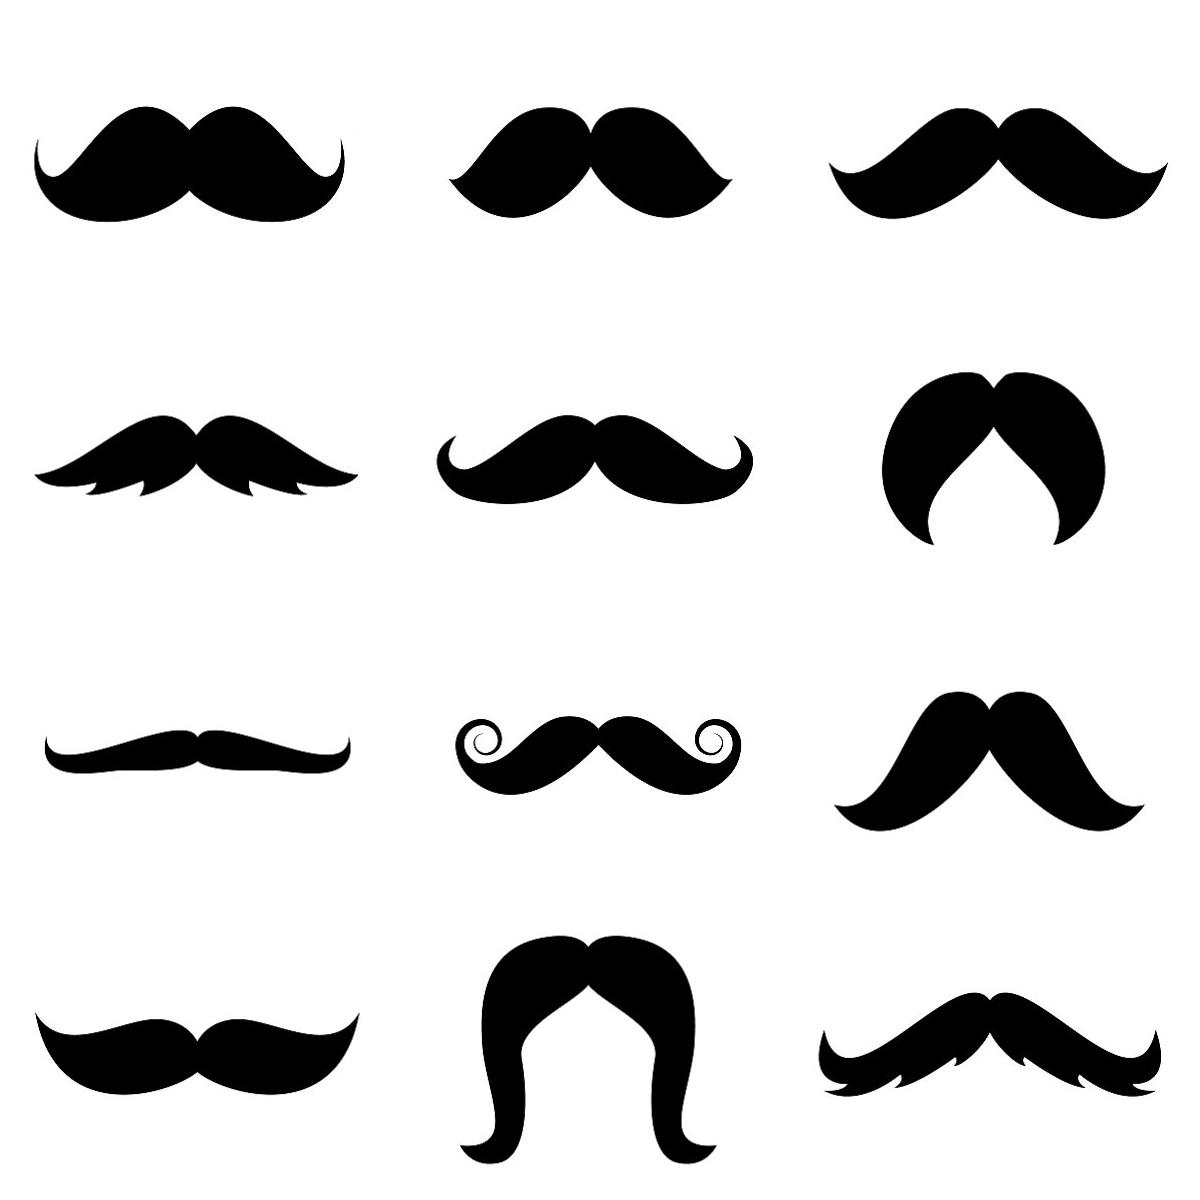 mustache template free printable stenciled drop cloth pillow tutorial our little villa [ 1200 x 1200 Pixel ]